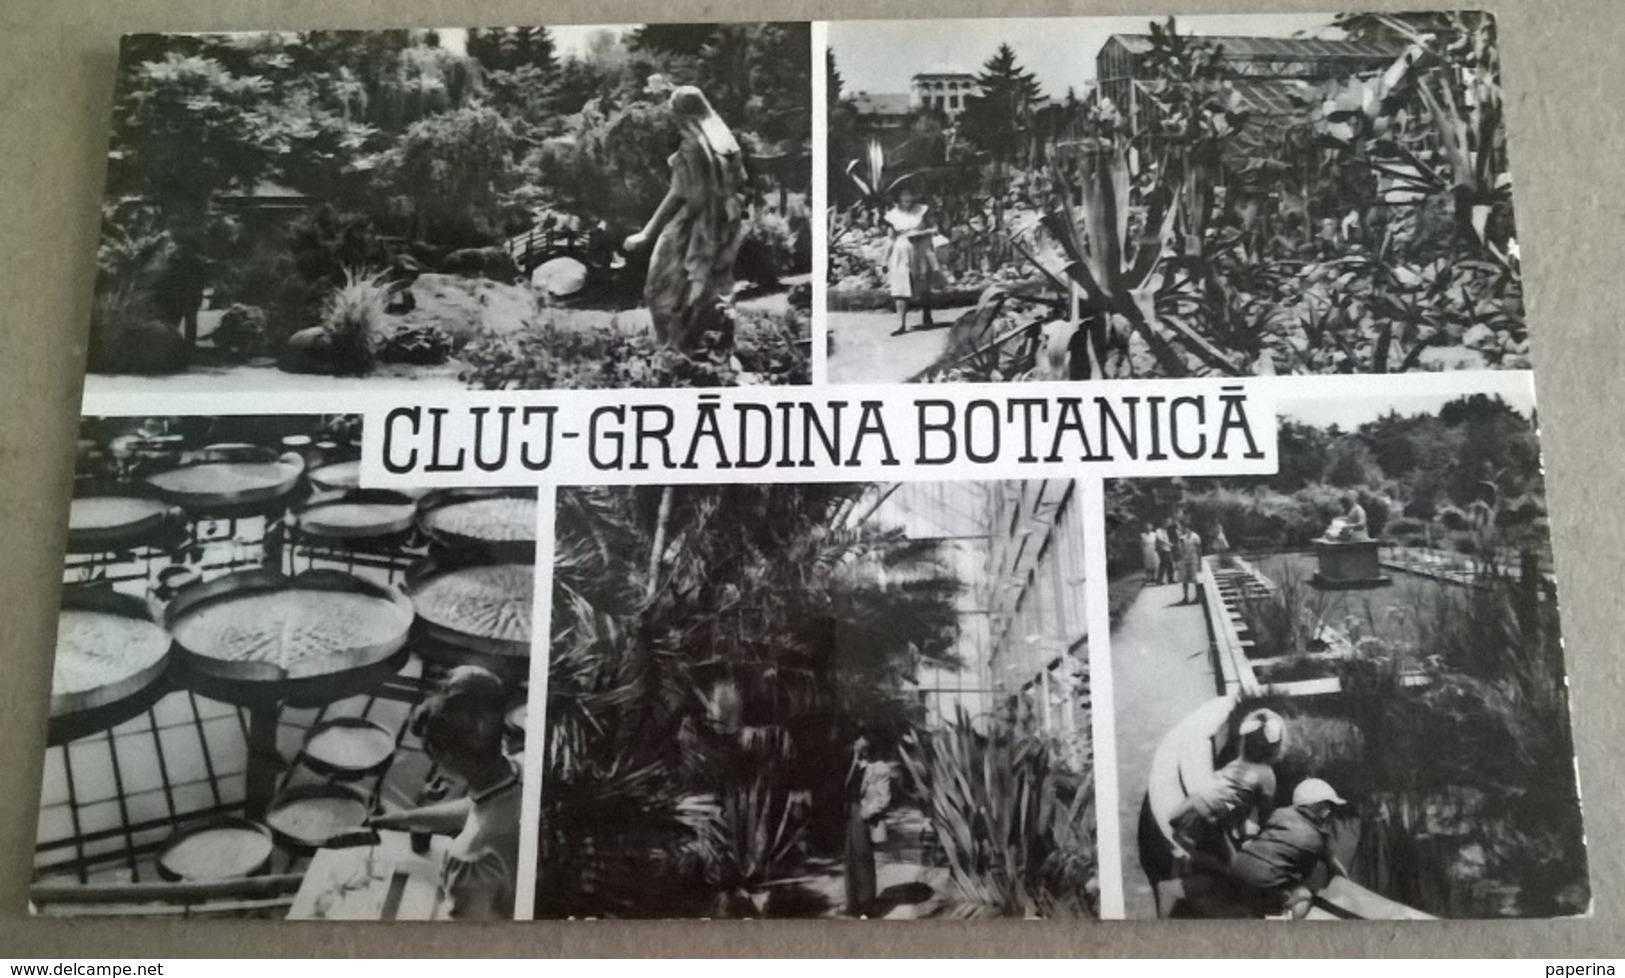 CLUJ GRADINA BOTANICA (194) - Romania